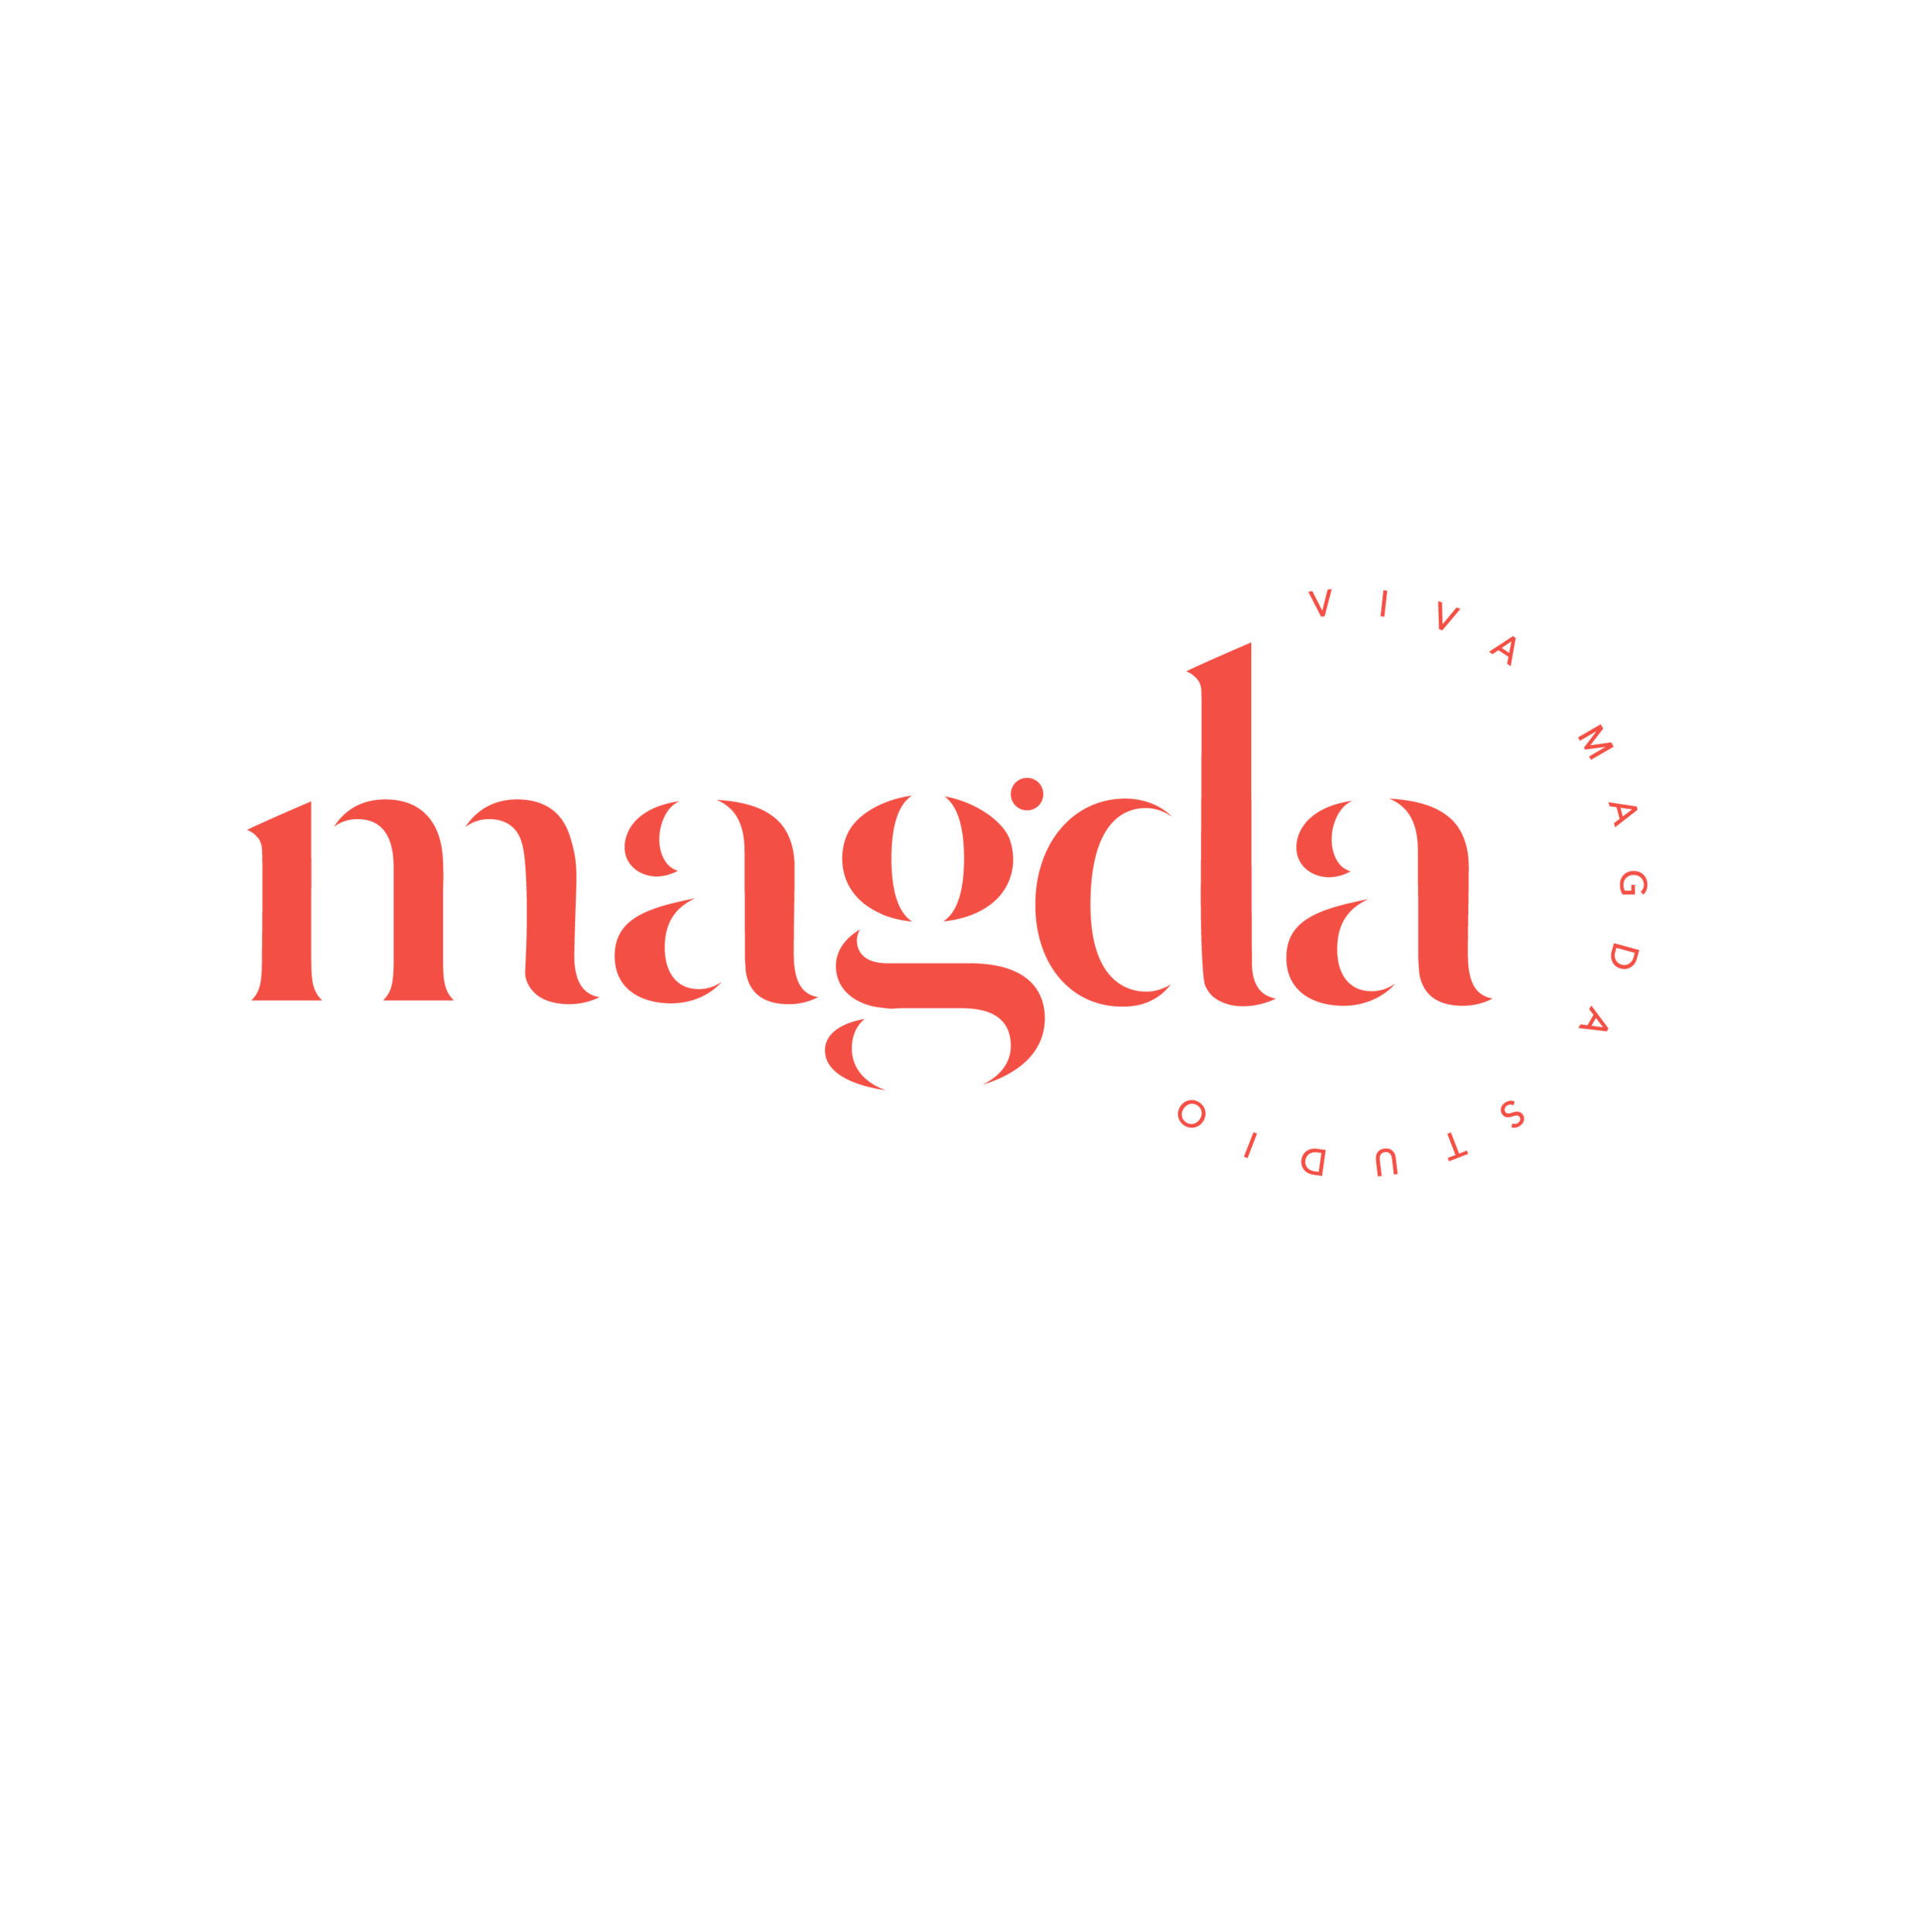 vivamagdastudio-logo-01 - Magda Aguirre.png